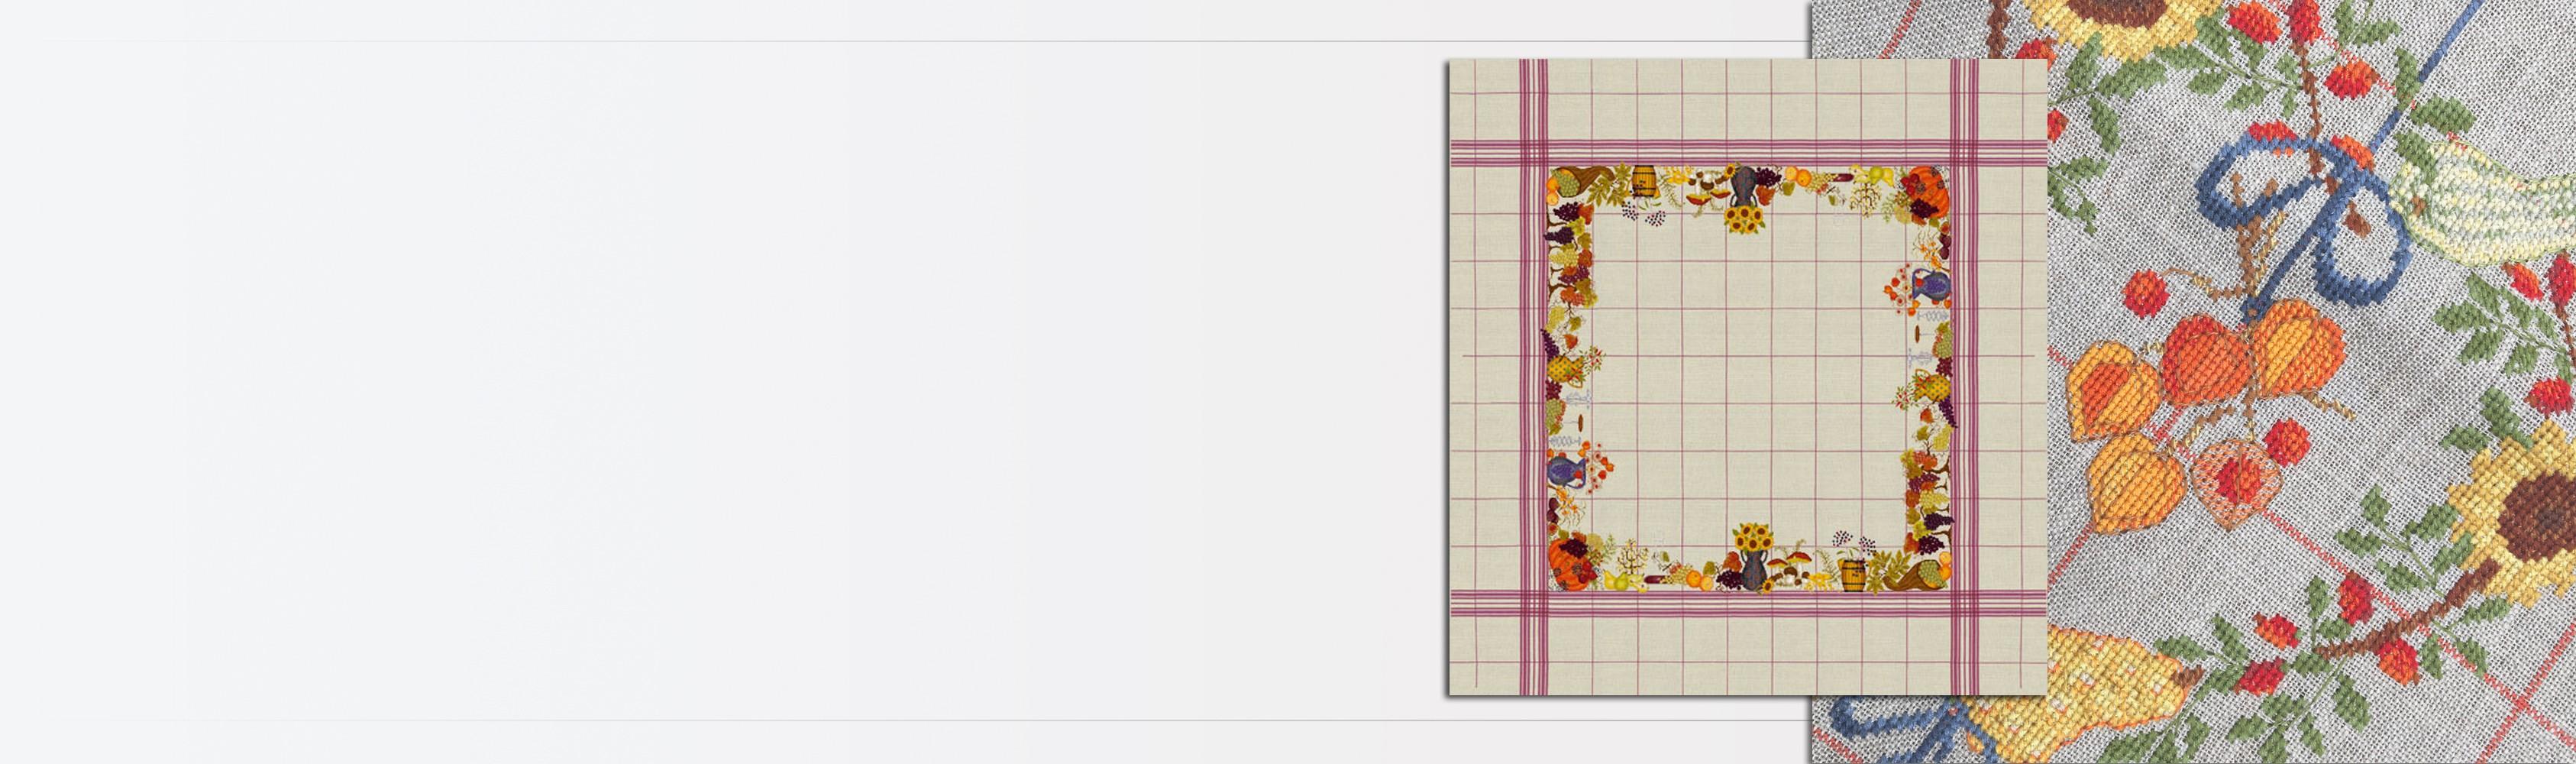 Tablecloth Autumn - counted cross stitch embroidery on natural linen. Le Bonheur des Dames 6034